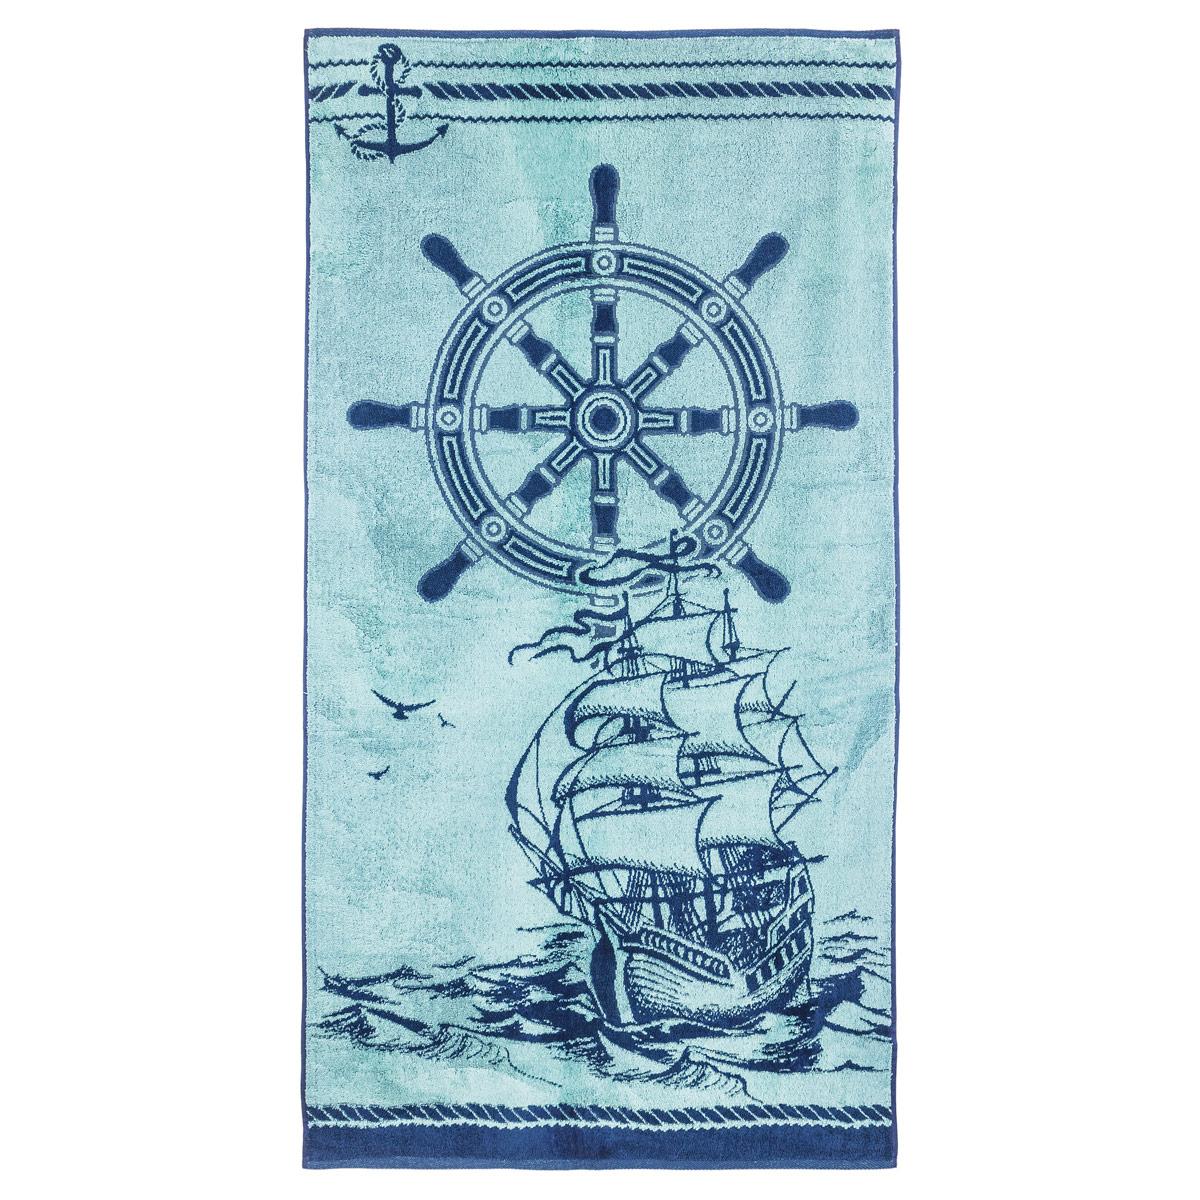 Полотенце Морское р. 70х140Махровые полотенца<br><br><br>Тип: Полотенце<br>Размер: 70х140<br>Материал: Махра